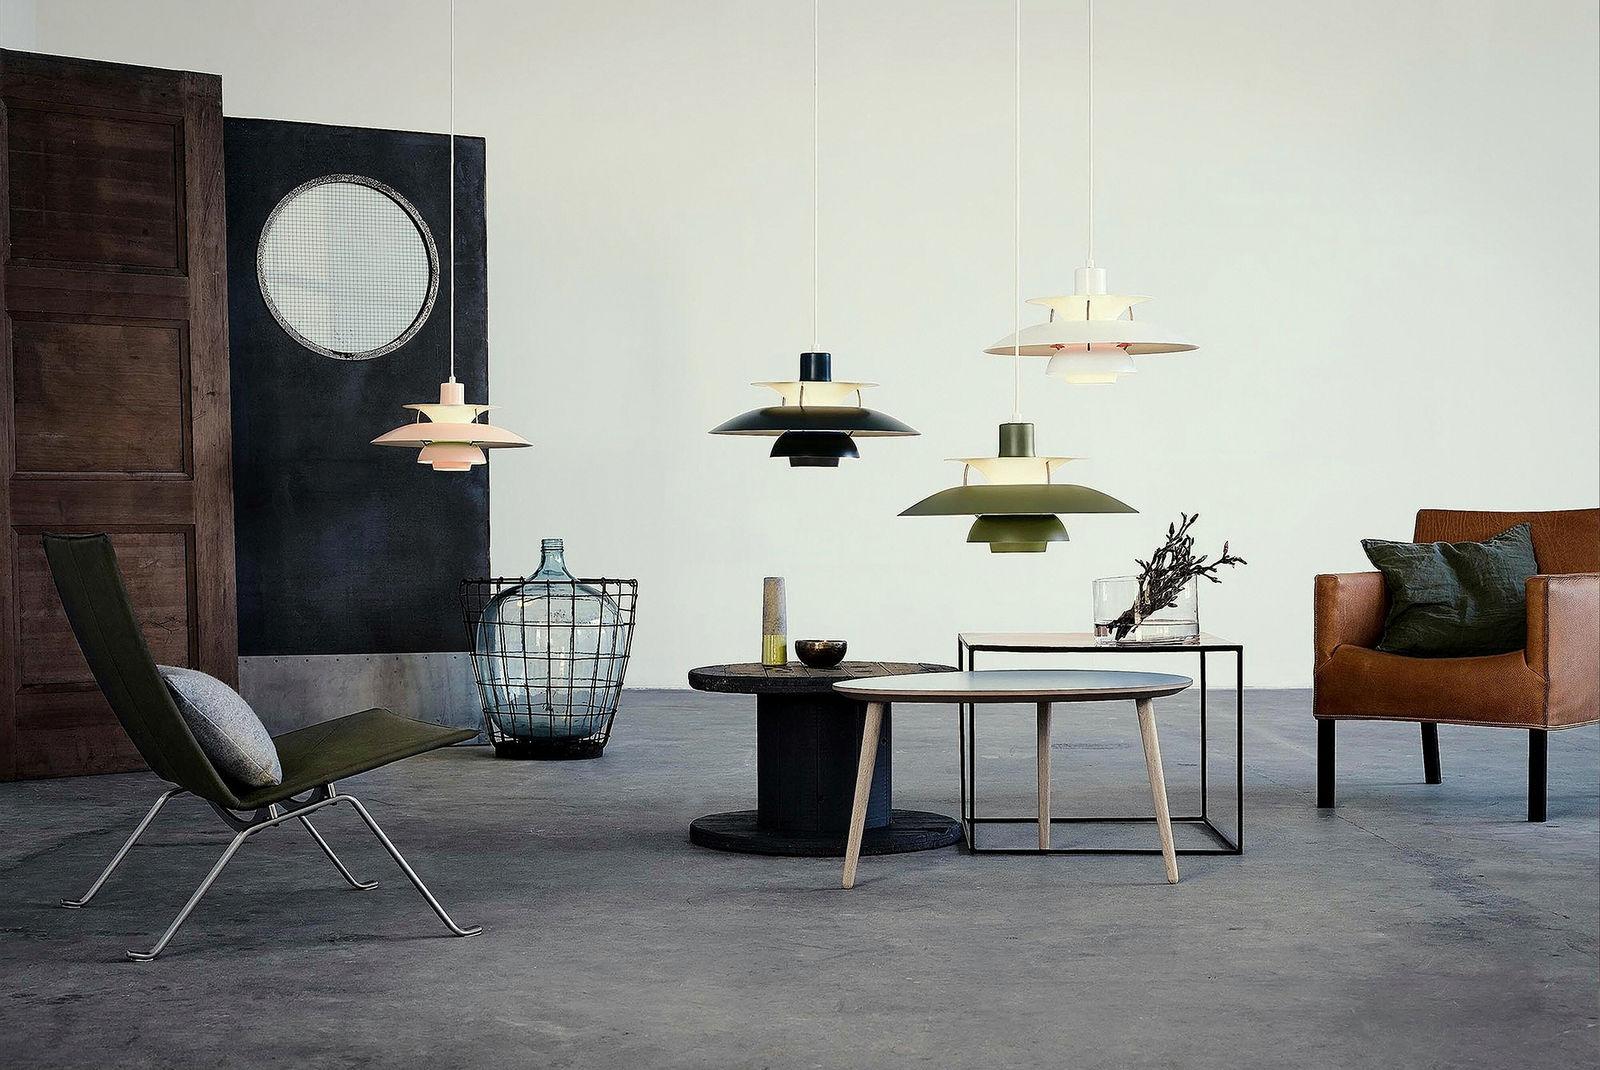 PH Table Lamp designed by Poul Henningsen